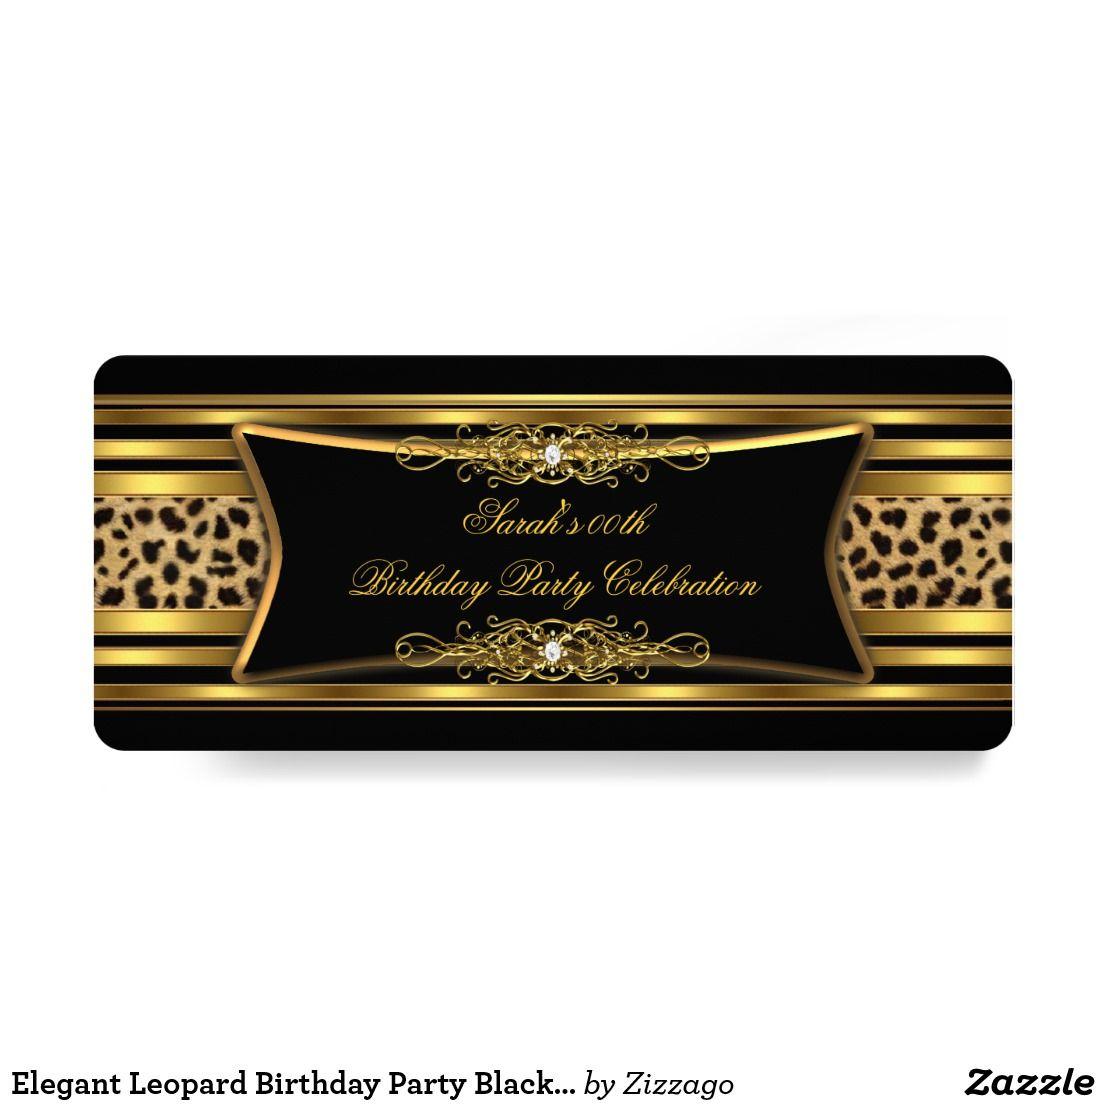 Elegant Leopard Birthday Party Black Gold Invitation   Zazzle.com   Leopard birthday  parties, Leopard birthday, Elegant birthday party